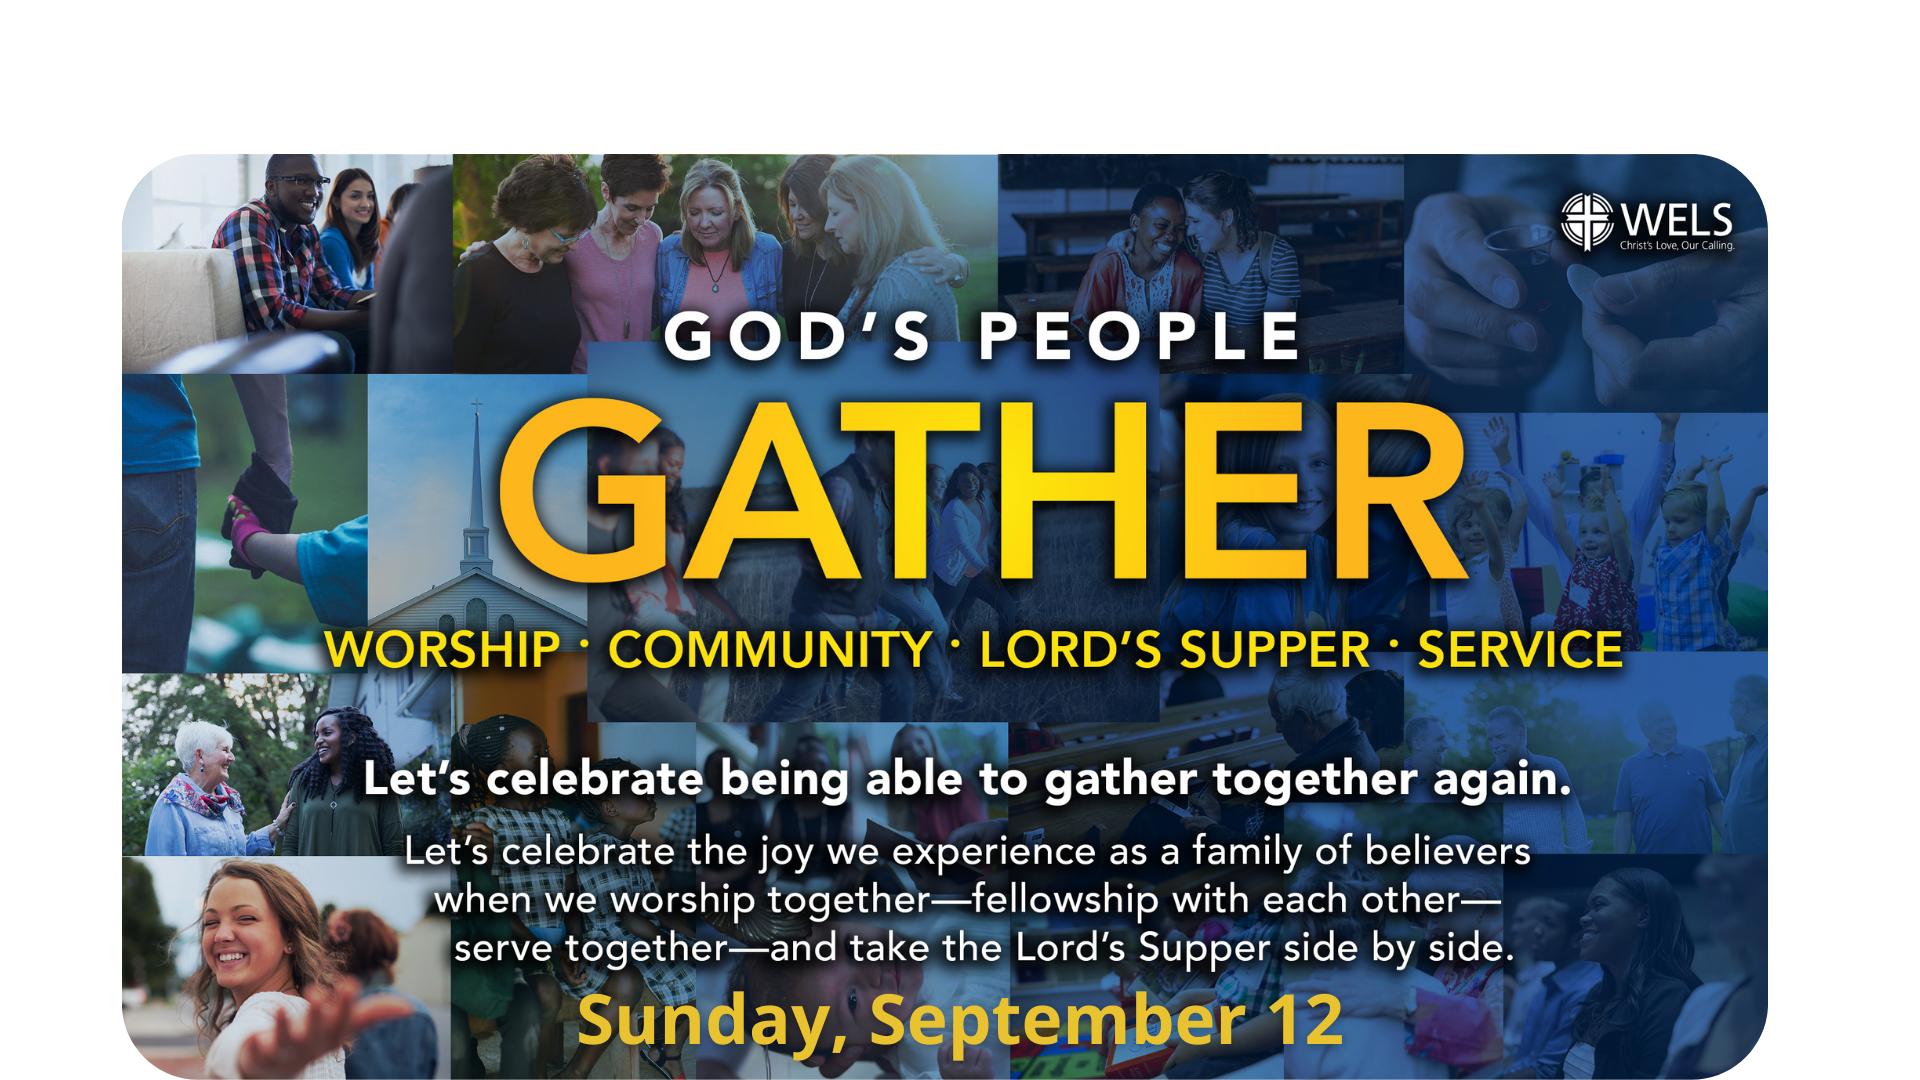 God's People Gather